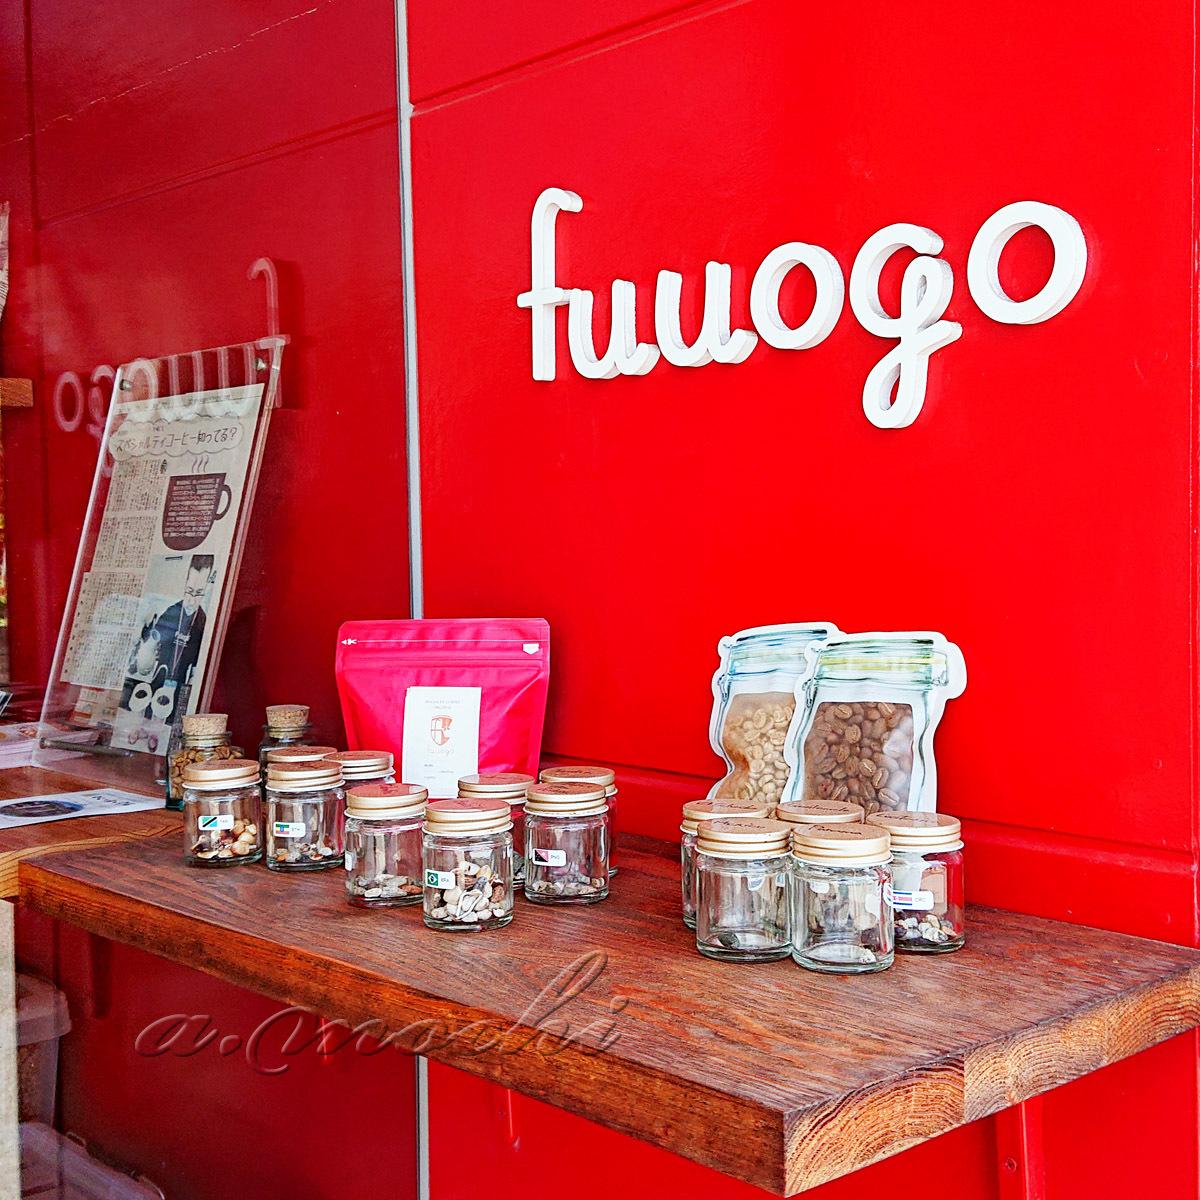 2_fuuogo4_shop.jpg